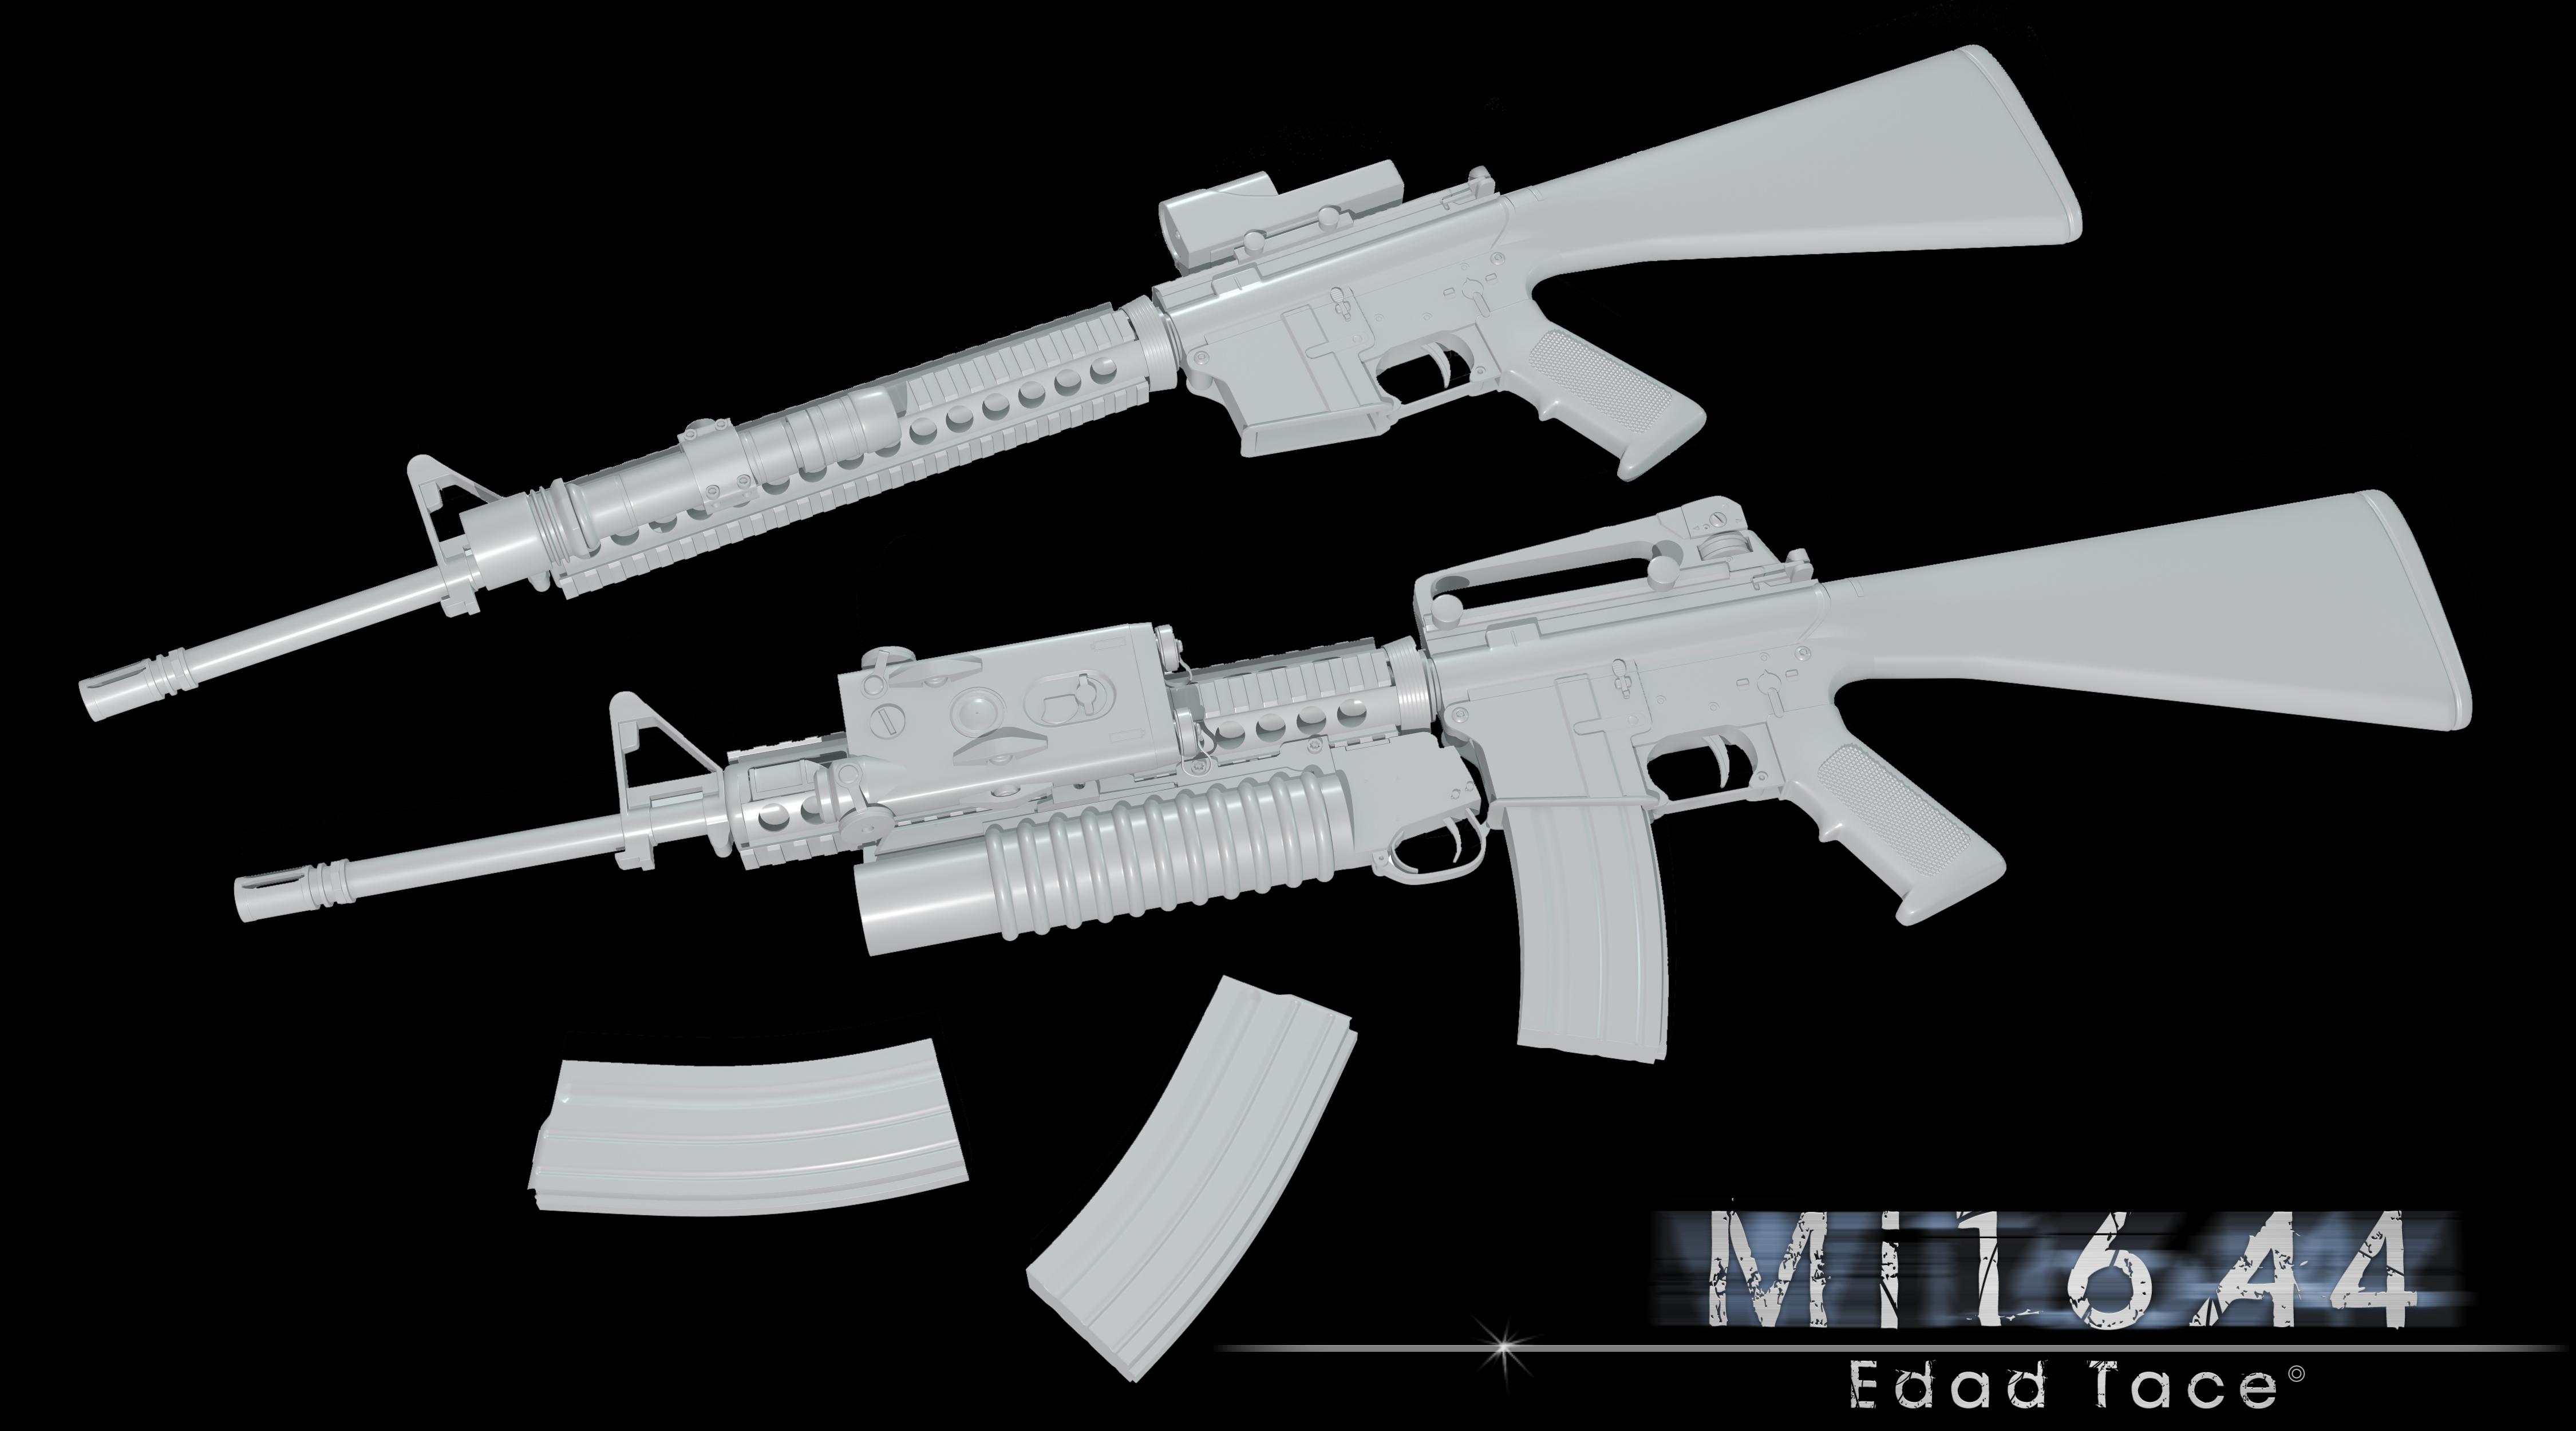 M16A4 by mSkull001 on DeviantArt